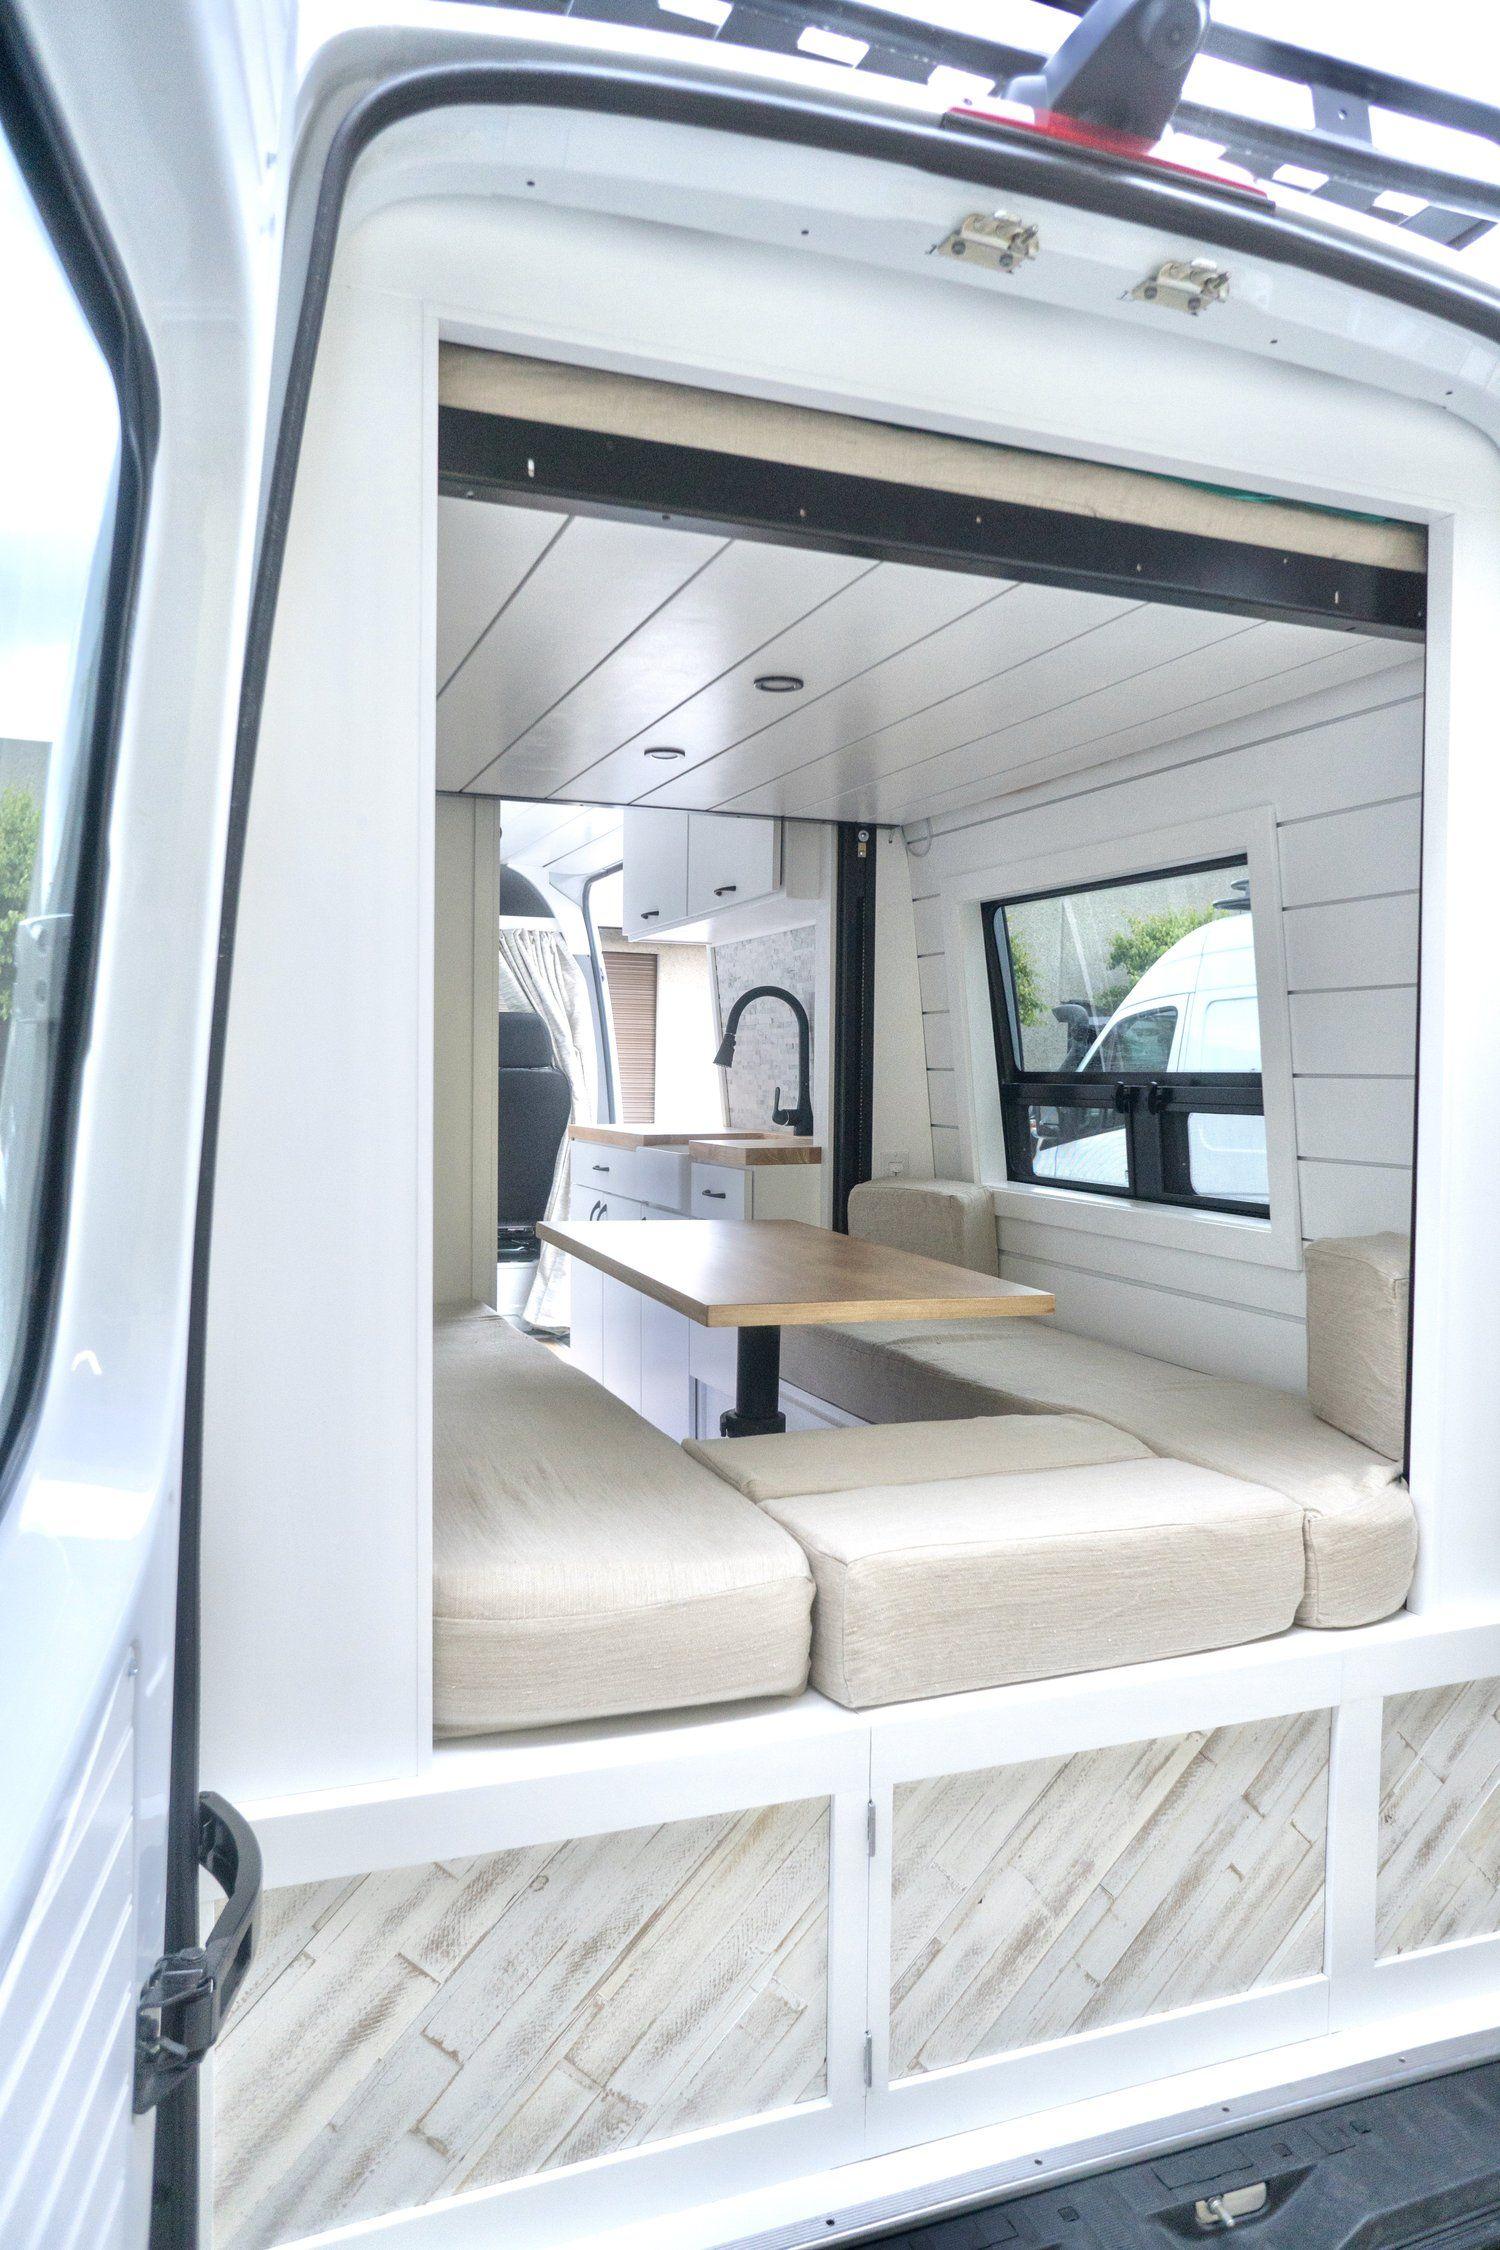 4x4 Sprinter Van Tour 170 Extended Sprinter Van Conversion For Family Of Four Sara Alex James 40 Hours Of Freedom Van Conversion For Family Sprinter Van Conversion Van Life Diy